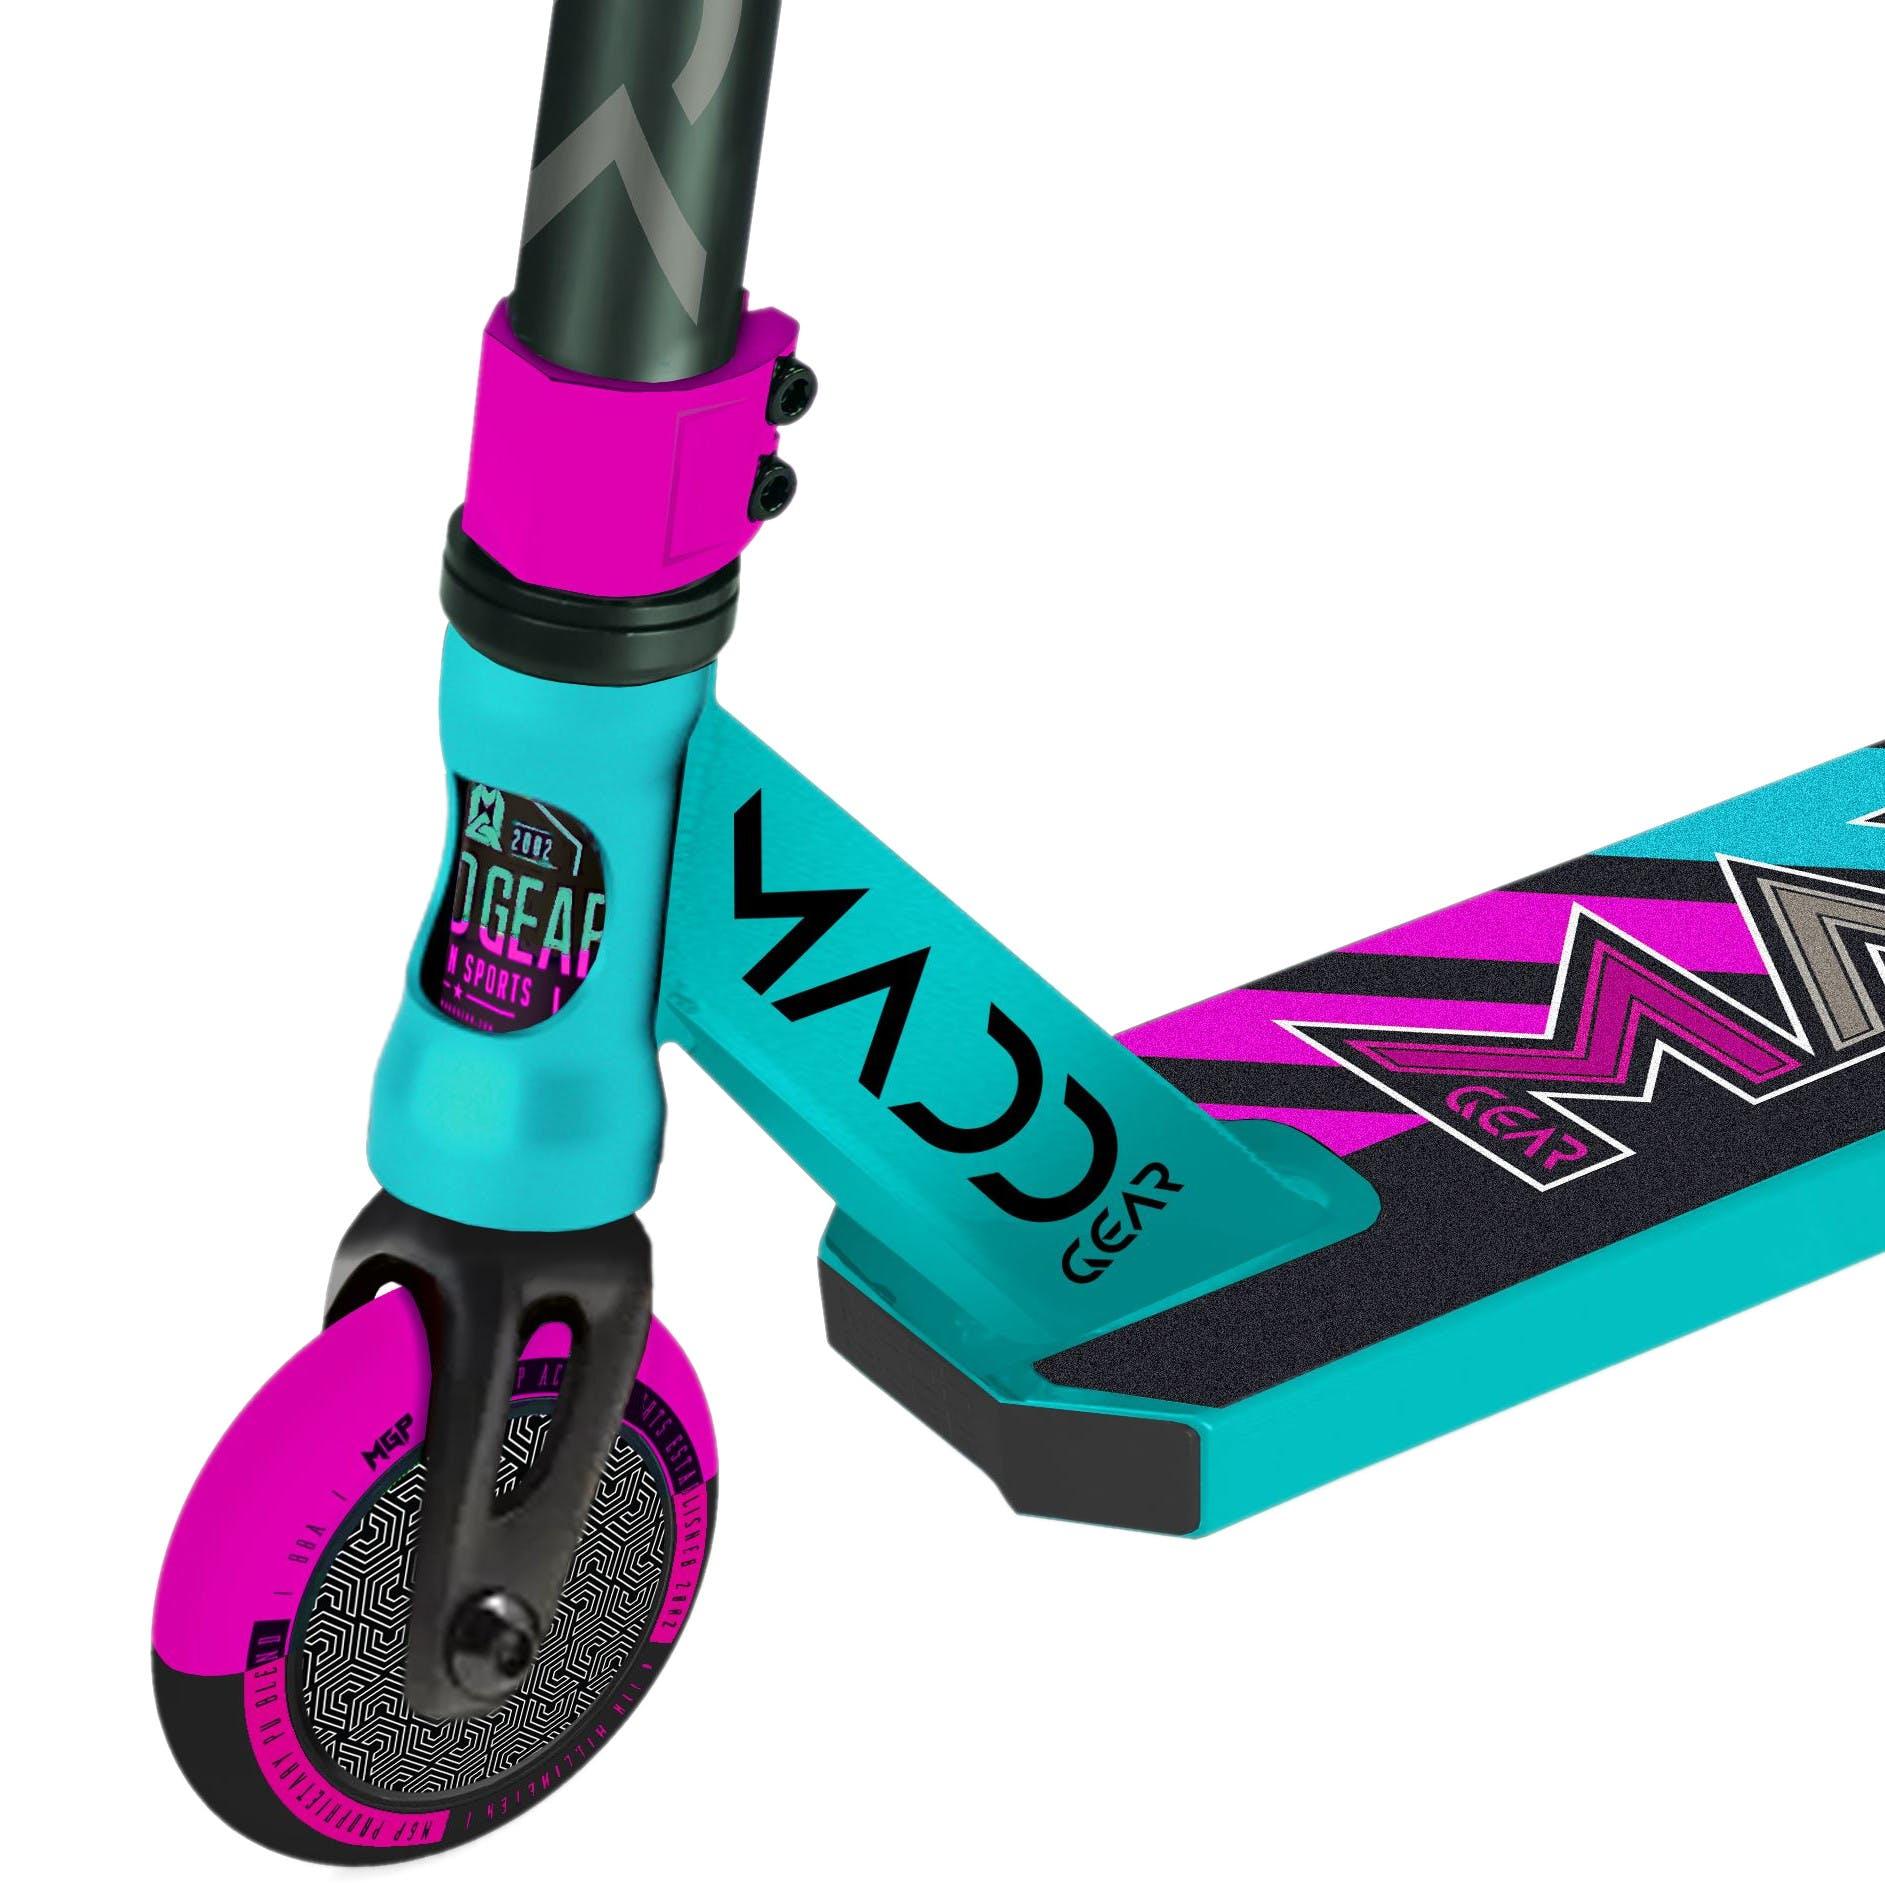 Madd Kick Pro V5 Stunt Scooter Teal / Pink